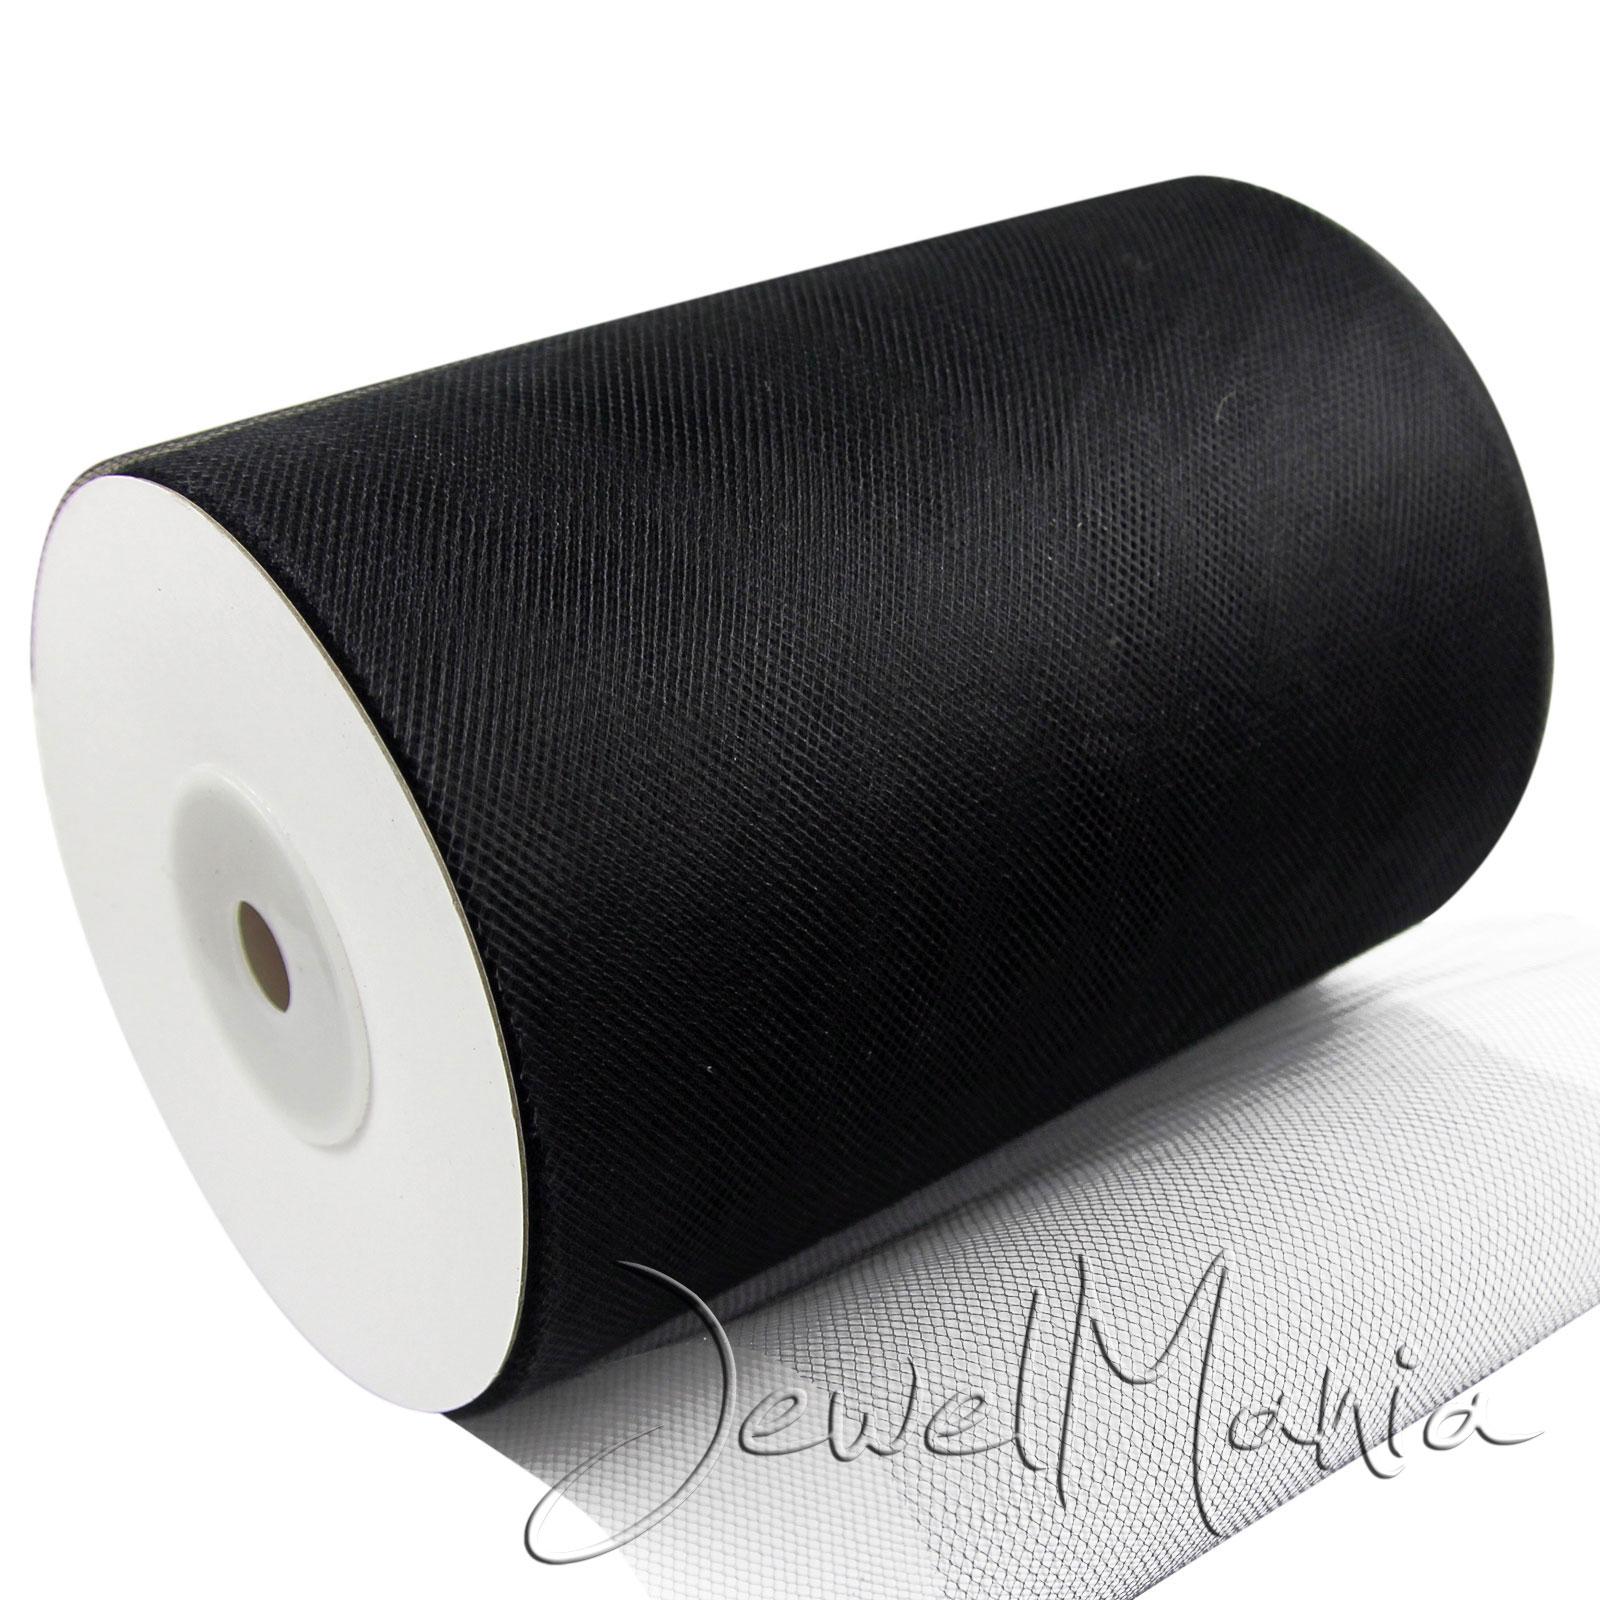 "Tutu TULLE ROLLS 6"" Wide x 25 Yards | Soft Nylon Netting Fabric Crafts Weddings"